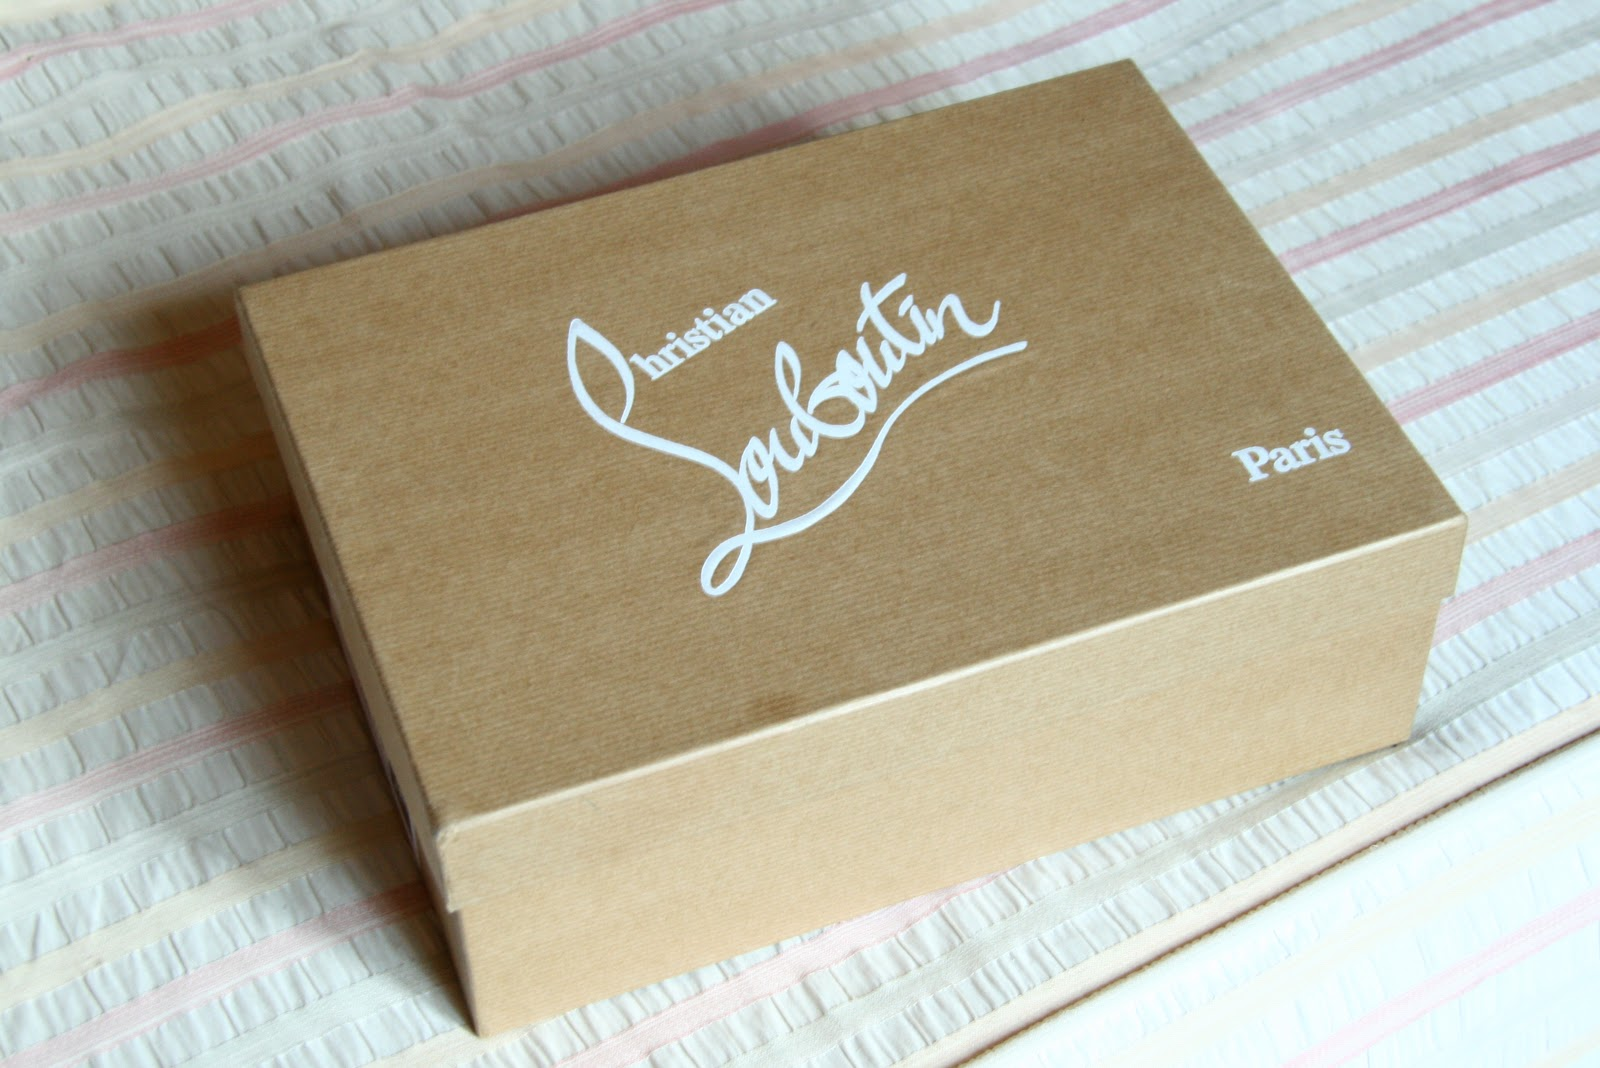 scatola+louboutin.jpg